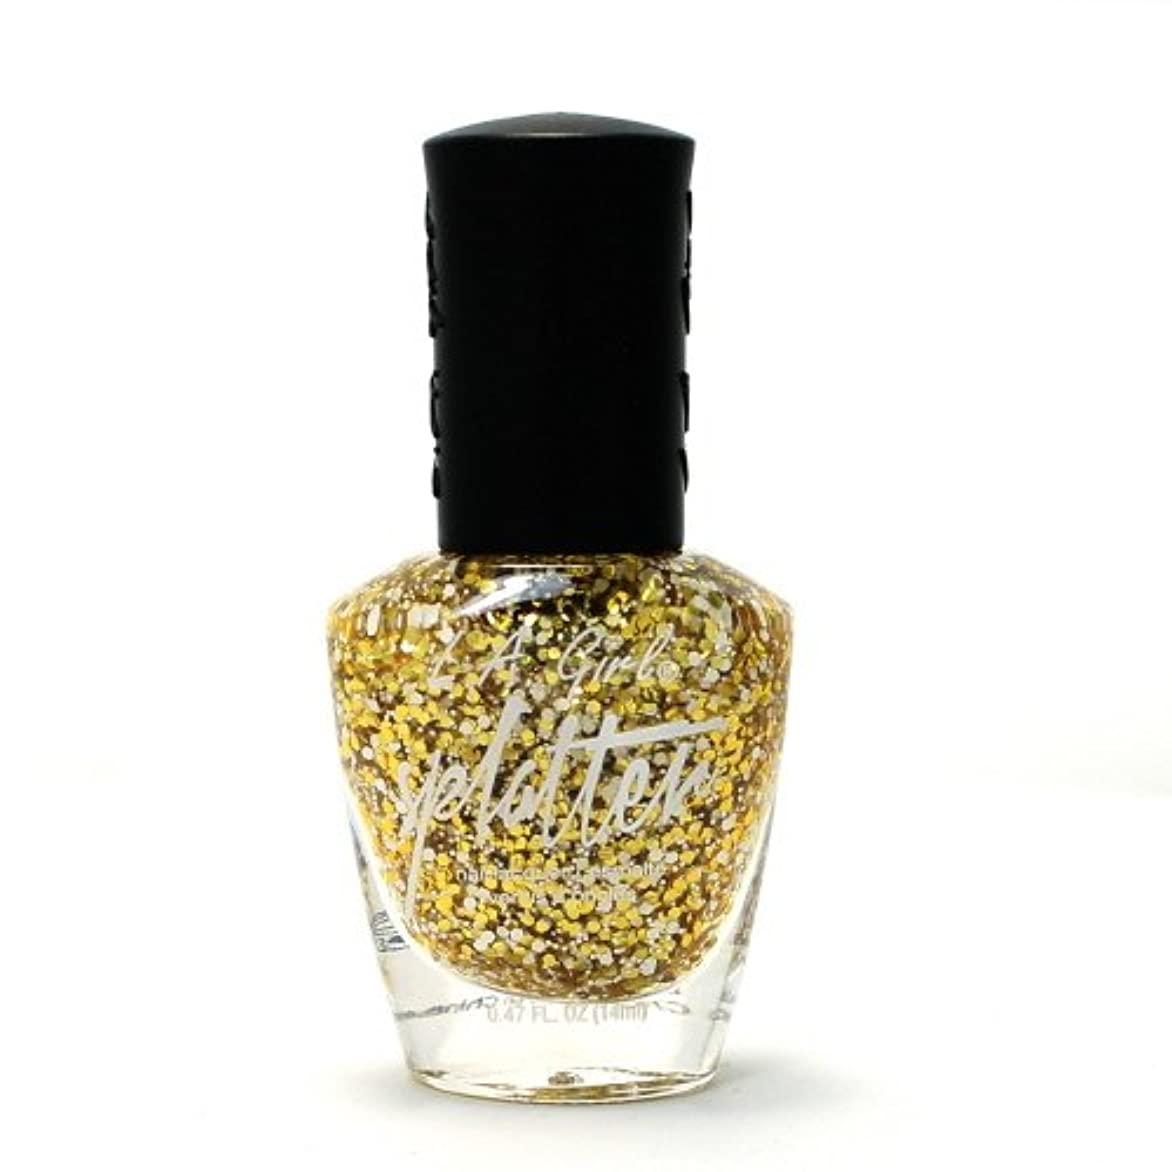 検出小屋長椅子LA GIRL Splatter Nail Polish - Sparkle (並行輸入品)